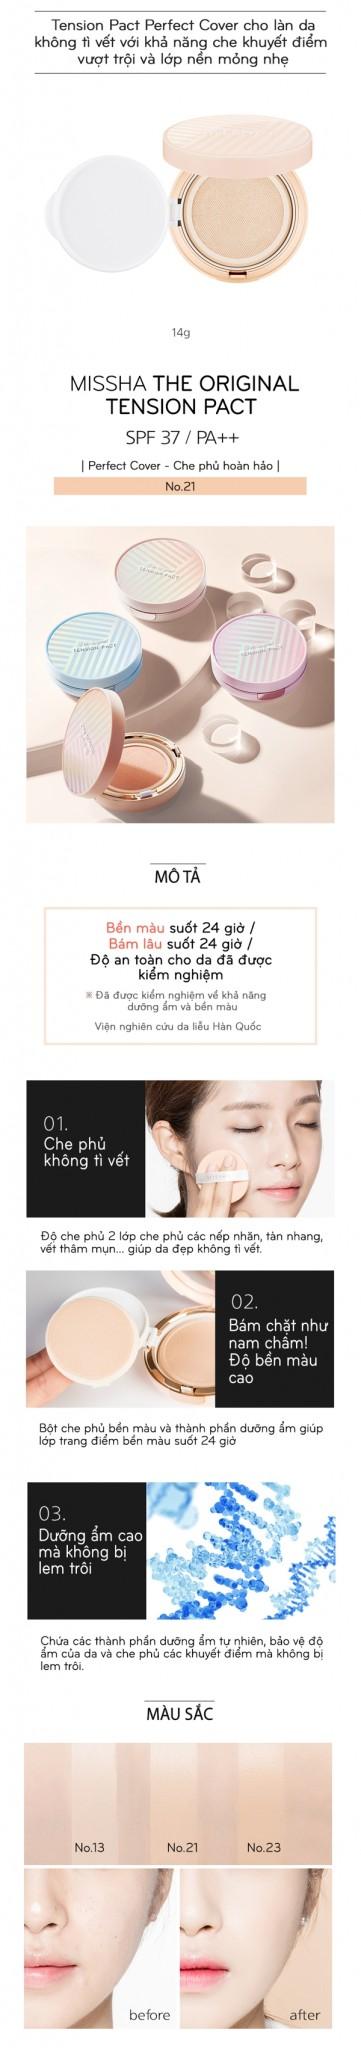 Phan nuoc Missha the original tension pact (8)